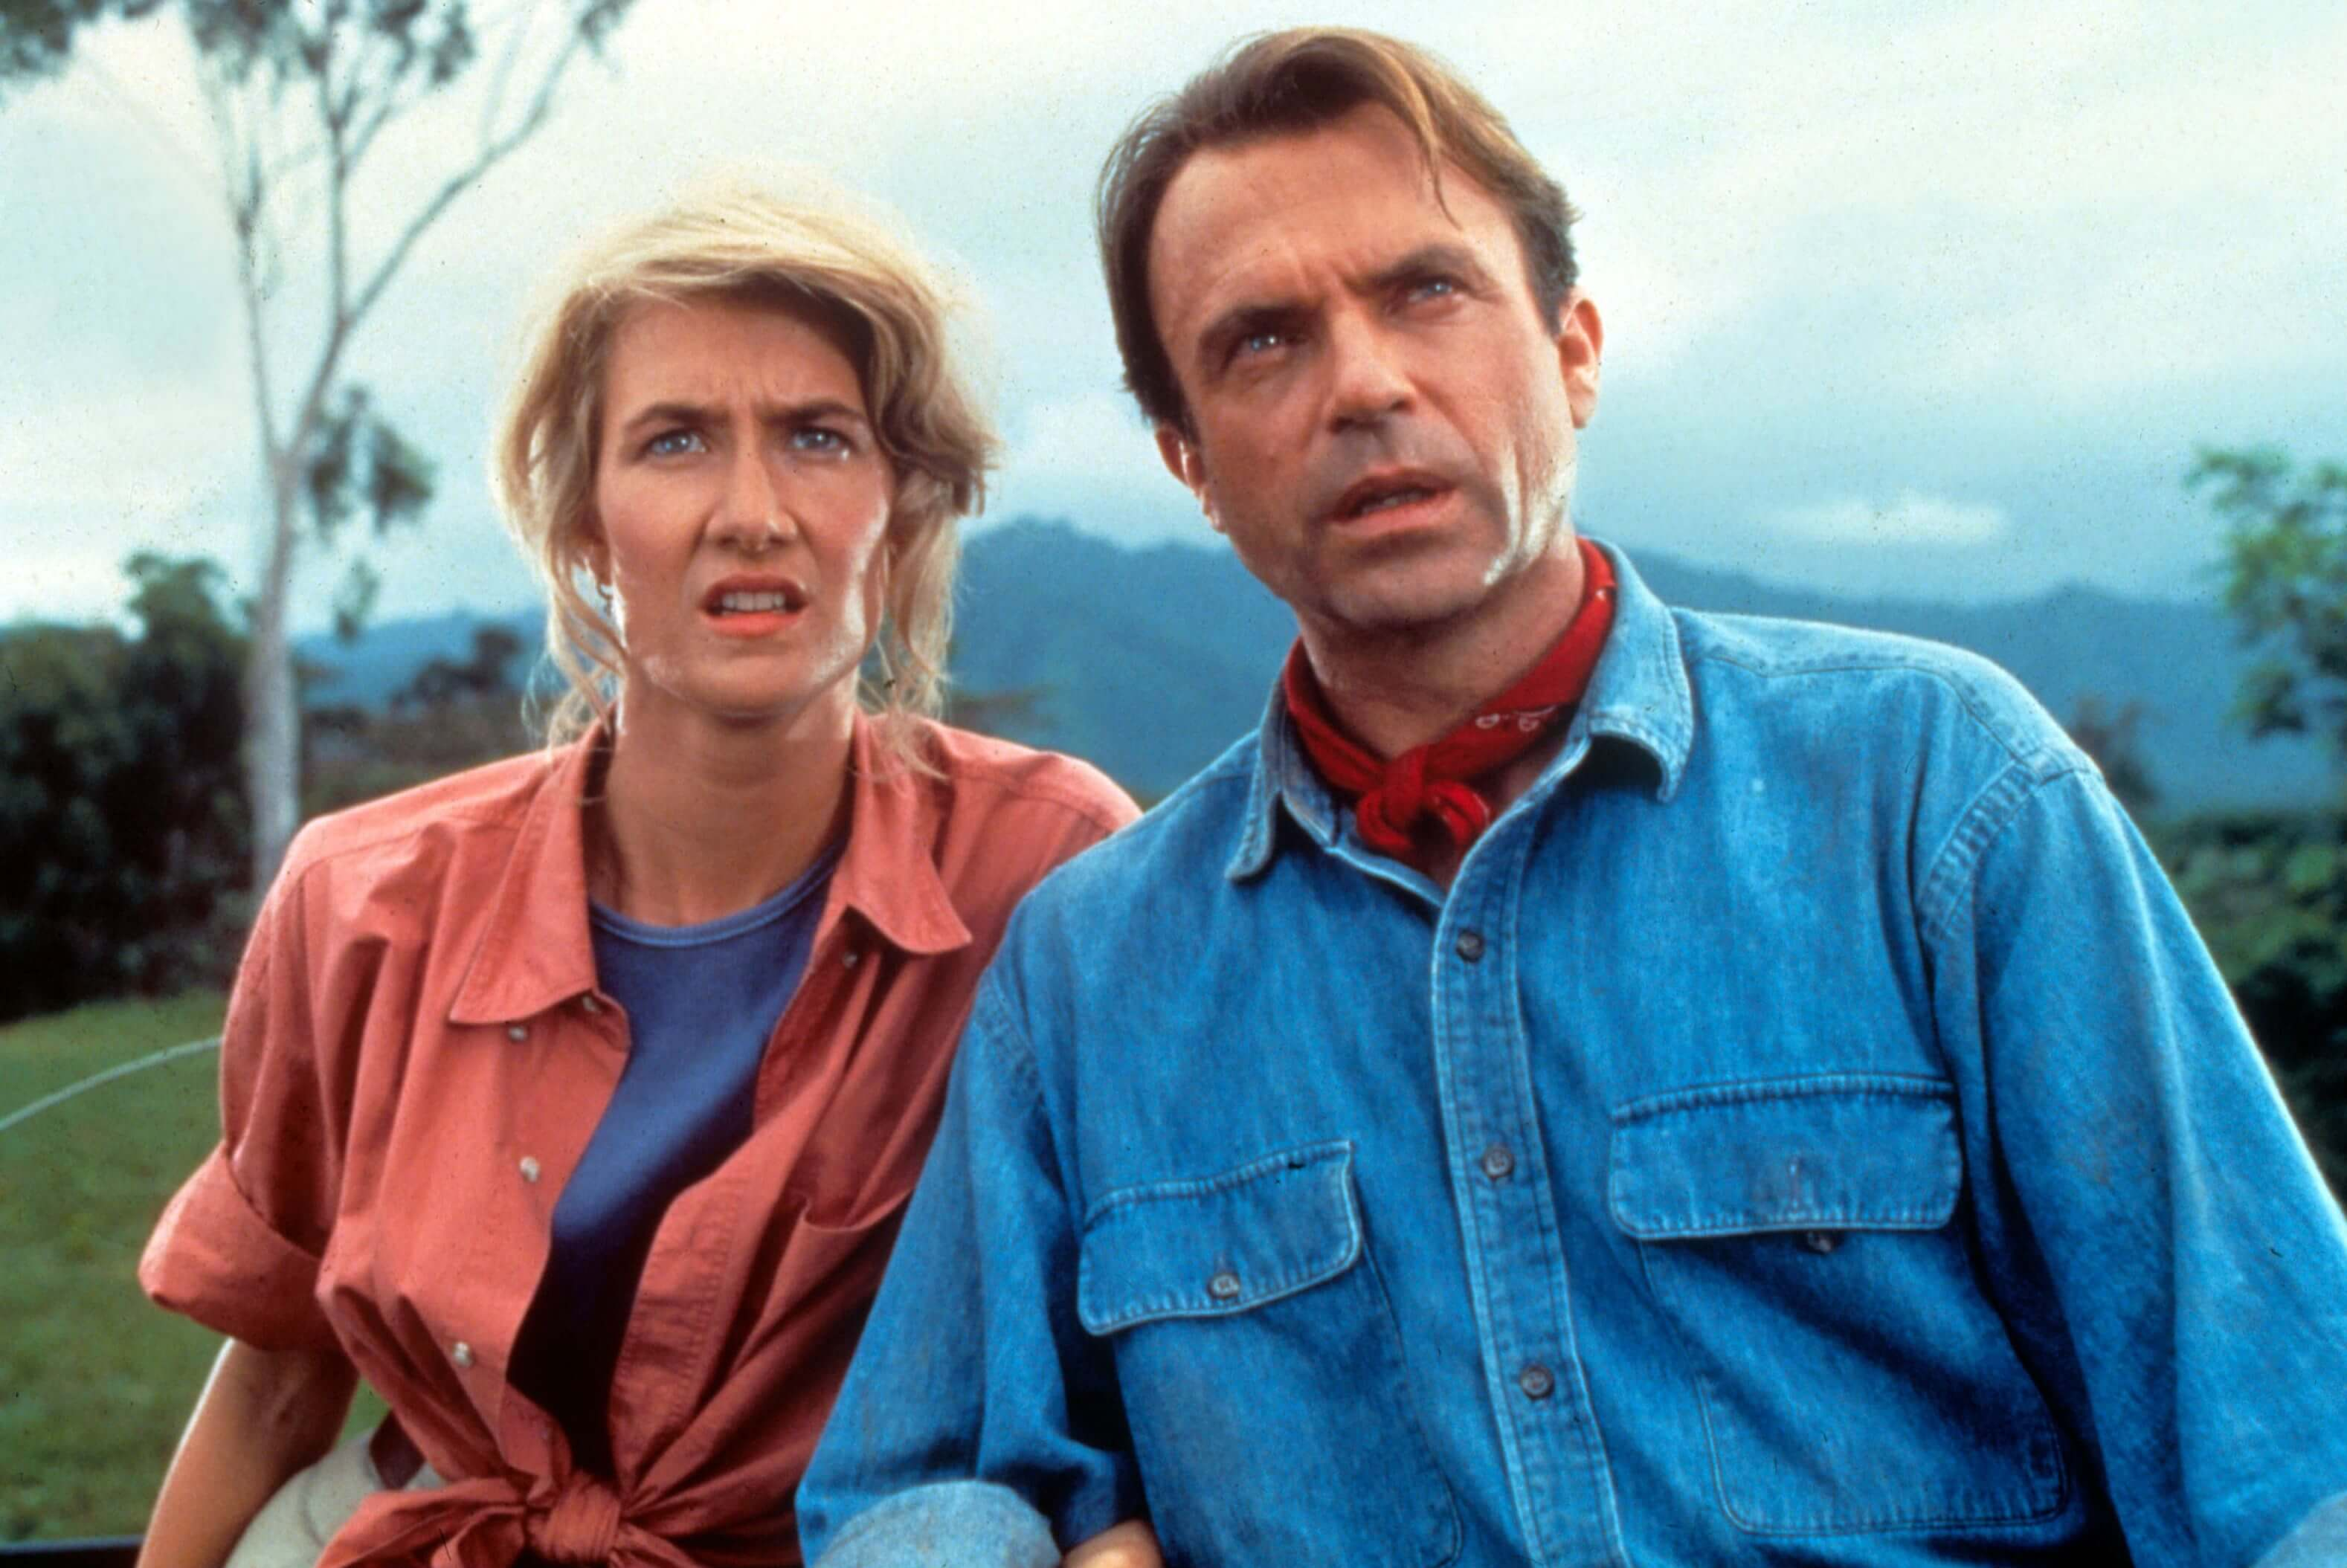 Jurassic Park | Canal AMC fará maratona da trilogia original